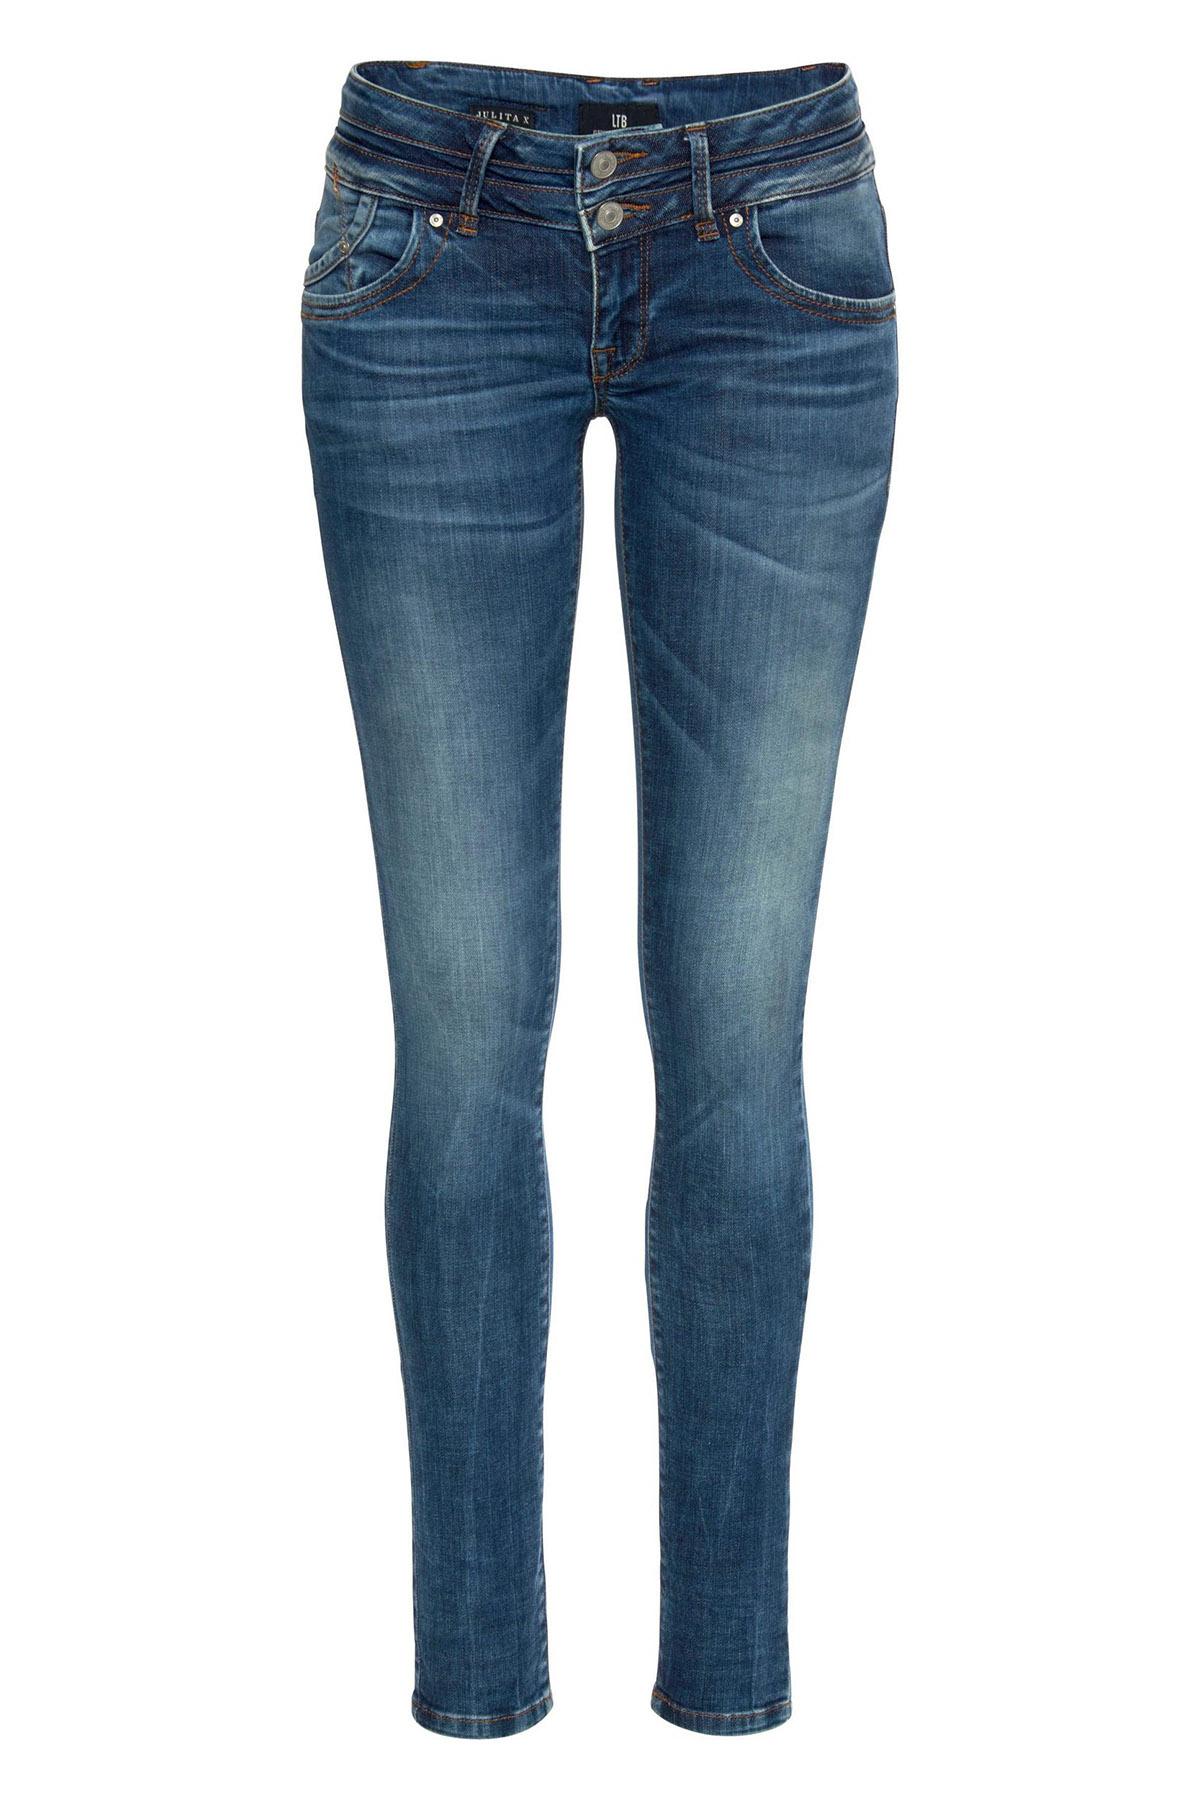 "Skinny Fit Jeans ""Julita"" Angellis Wash"